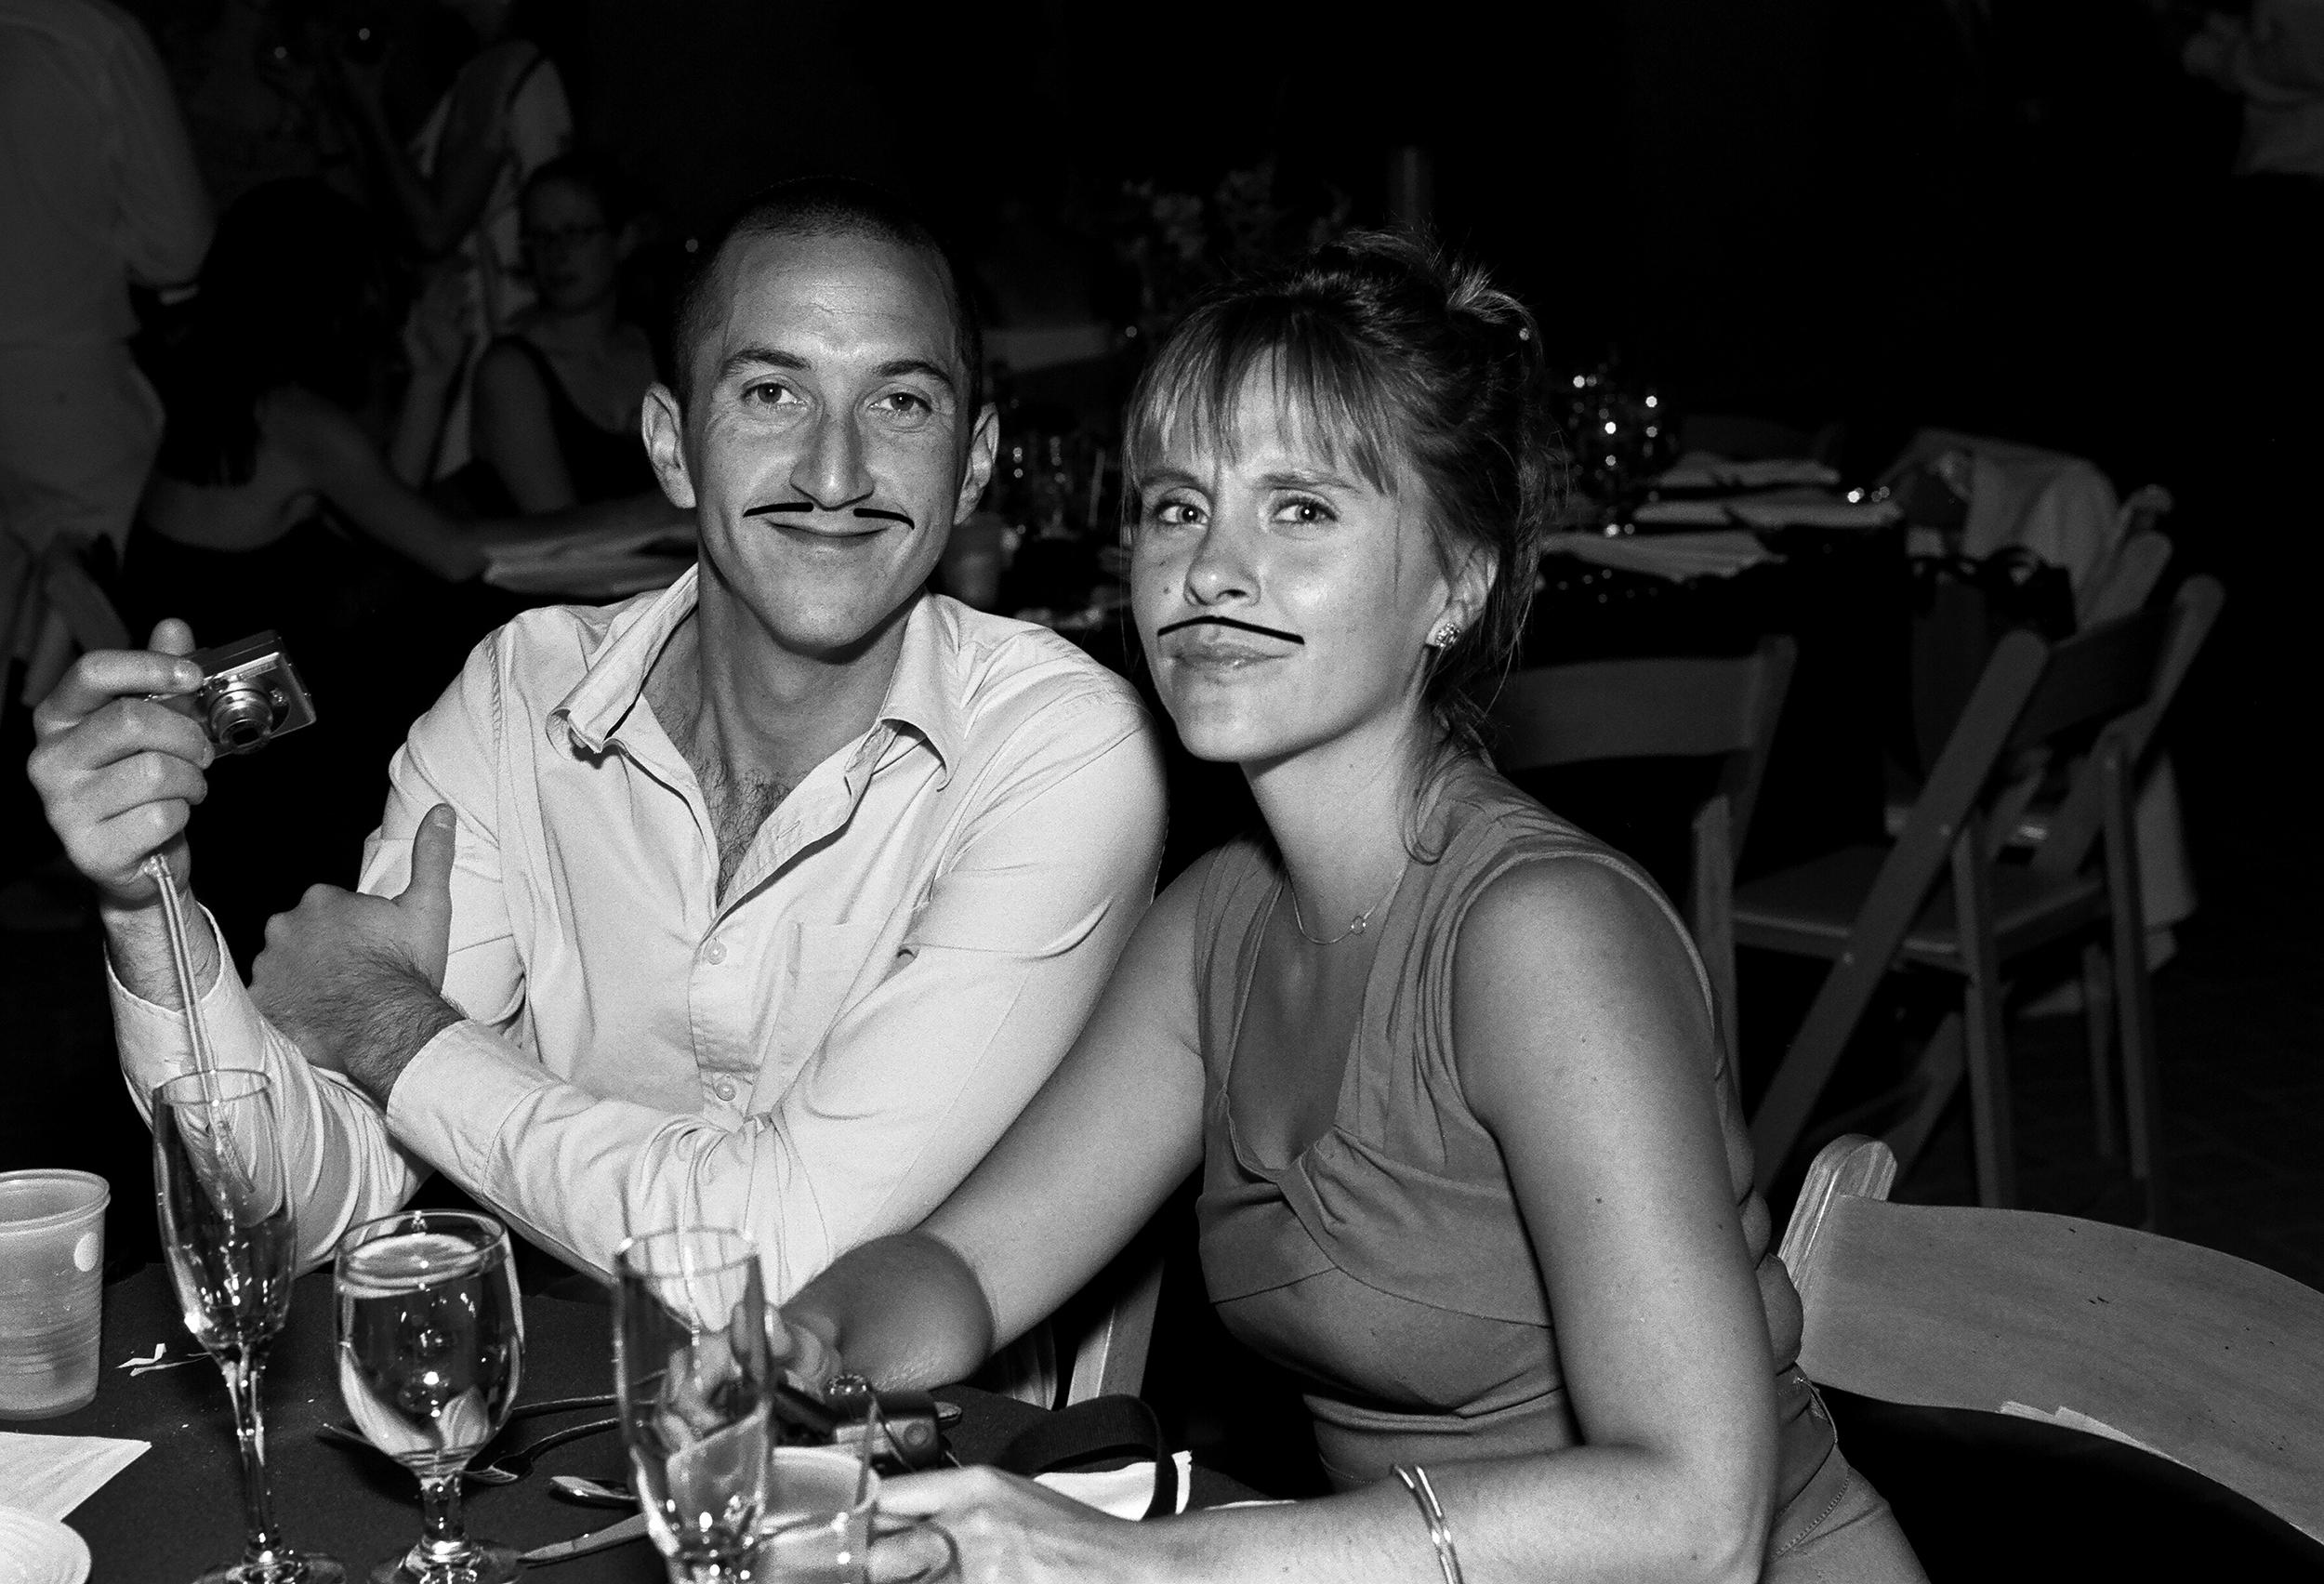 WEB_Mustache Couple_ Lewis8159-19.jpg